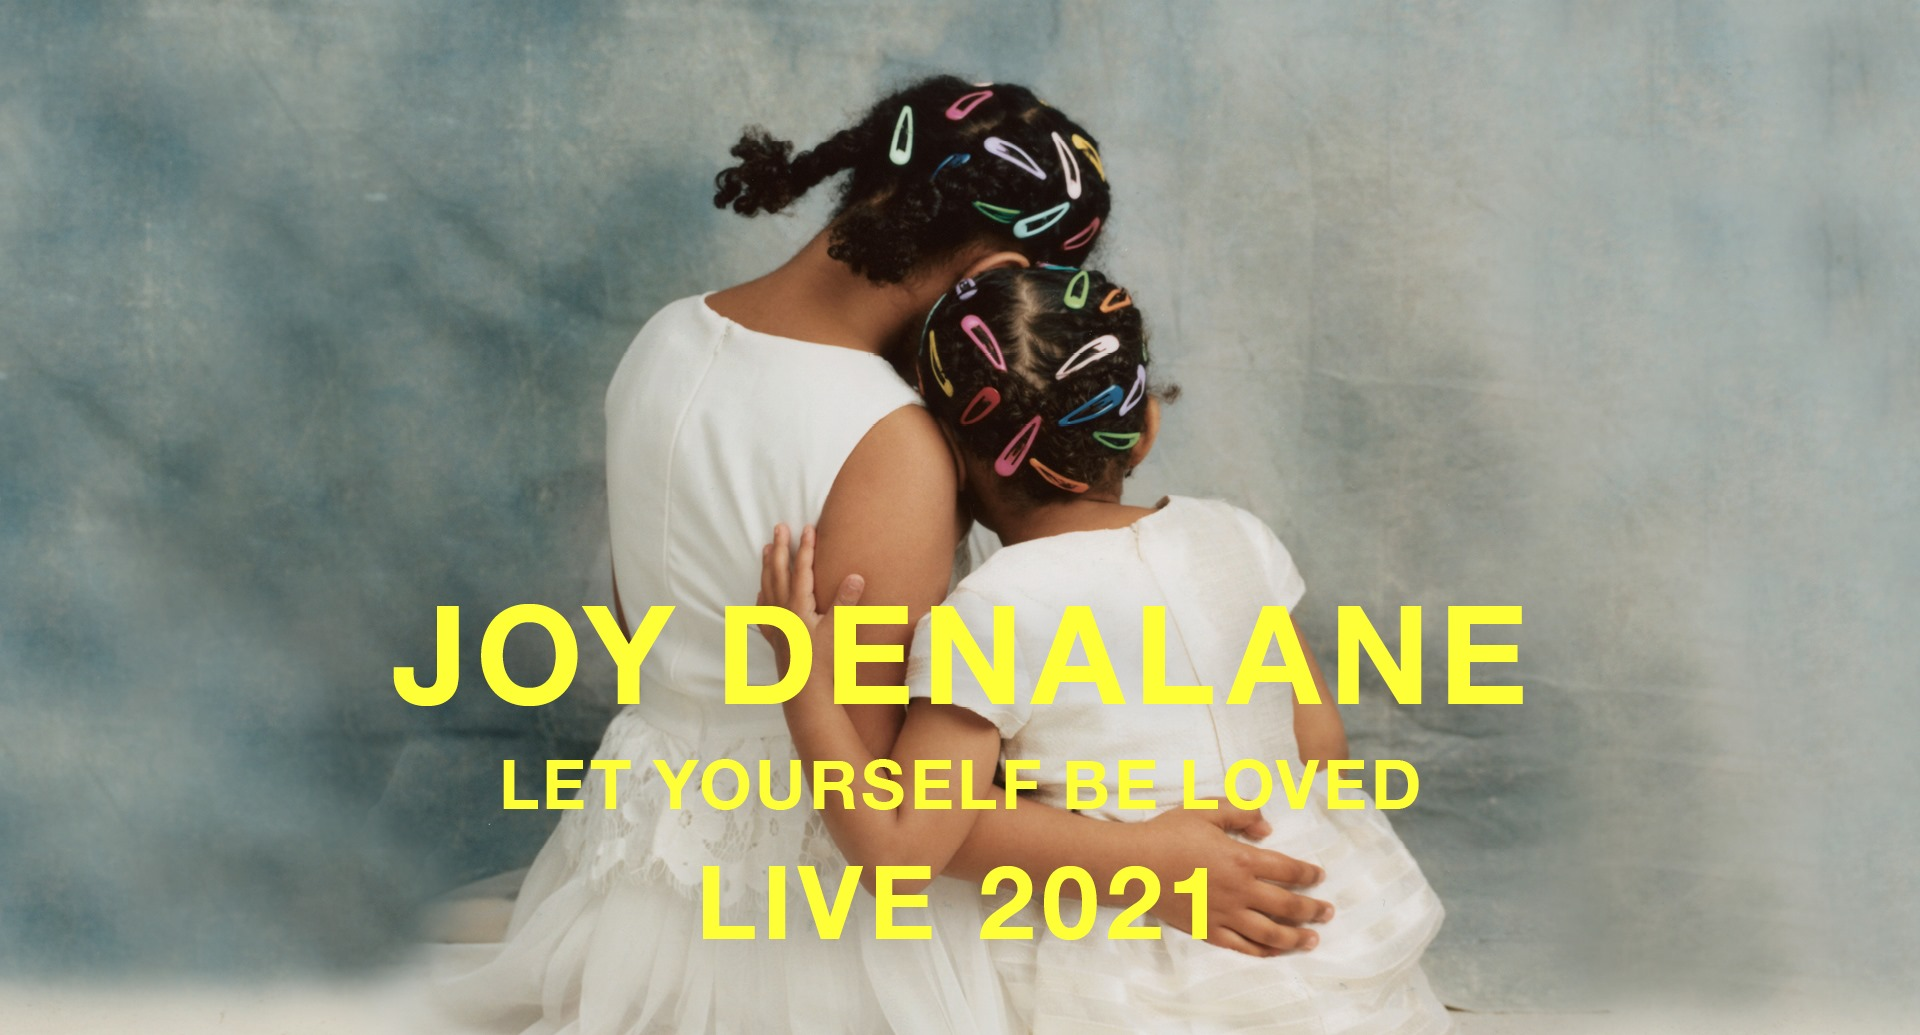 Joy Denalane am 3. April 2021 @ Grelle Forelle.